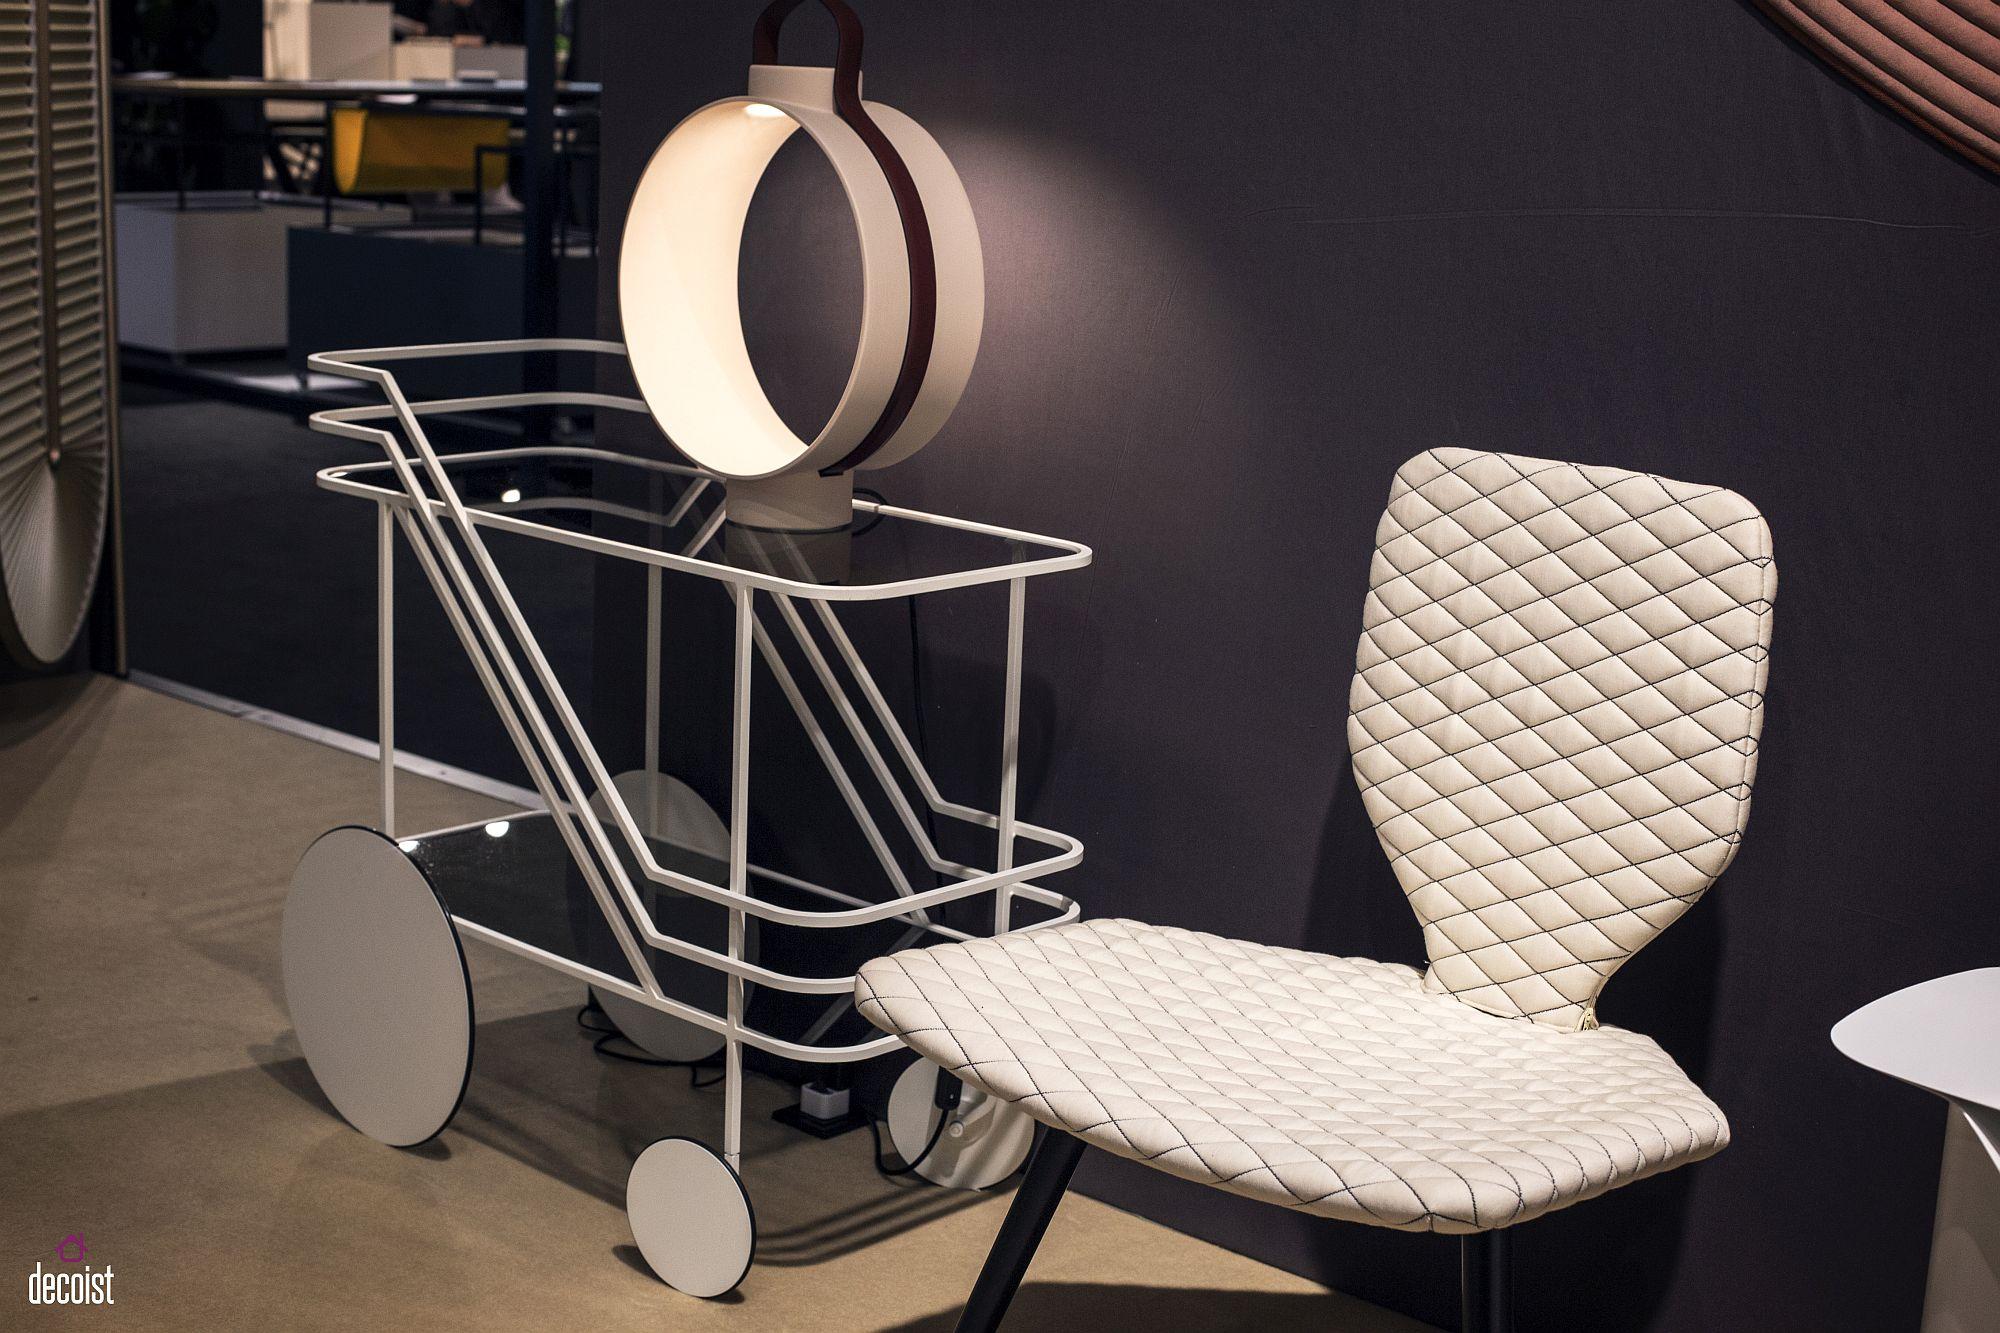 Dante-Come-as-You-Are-Bar-Cart-designed-by-Christophe-de-la-Fontaine